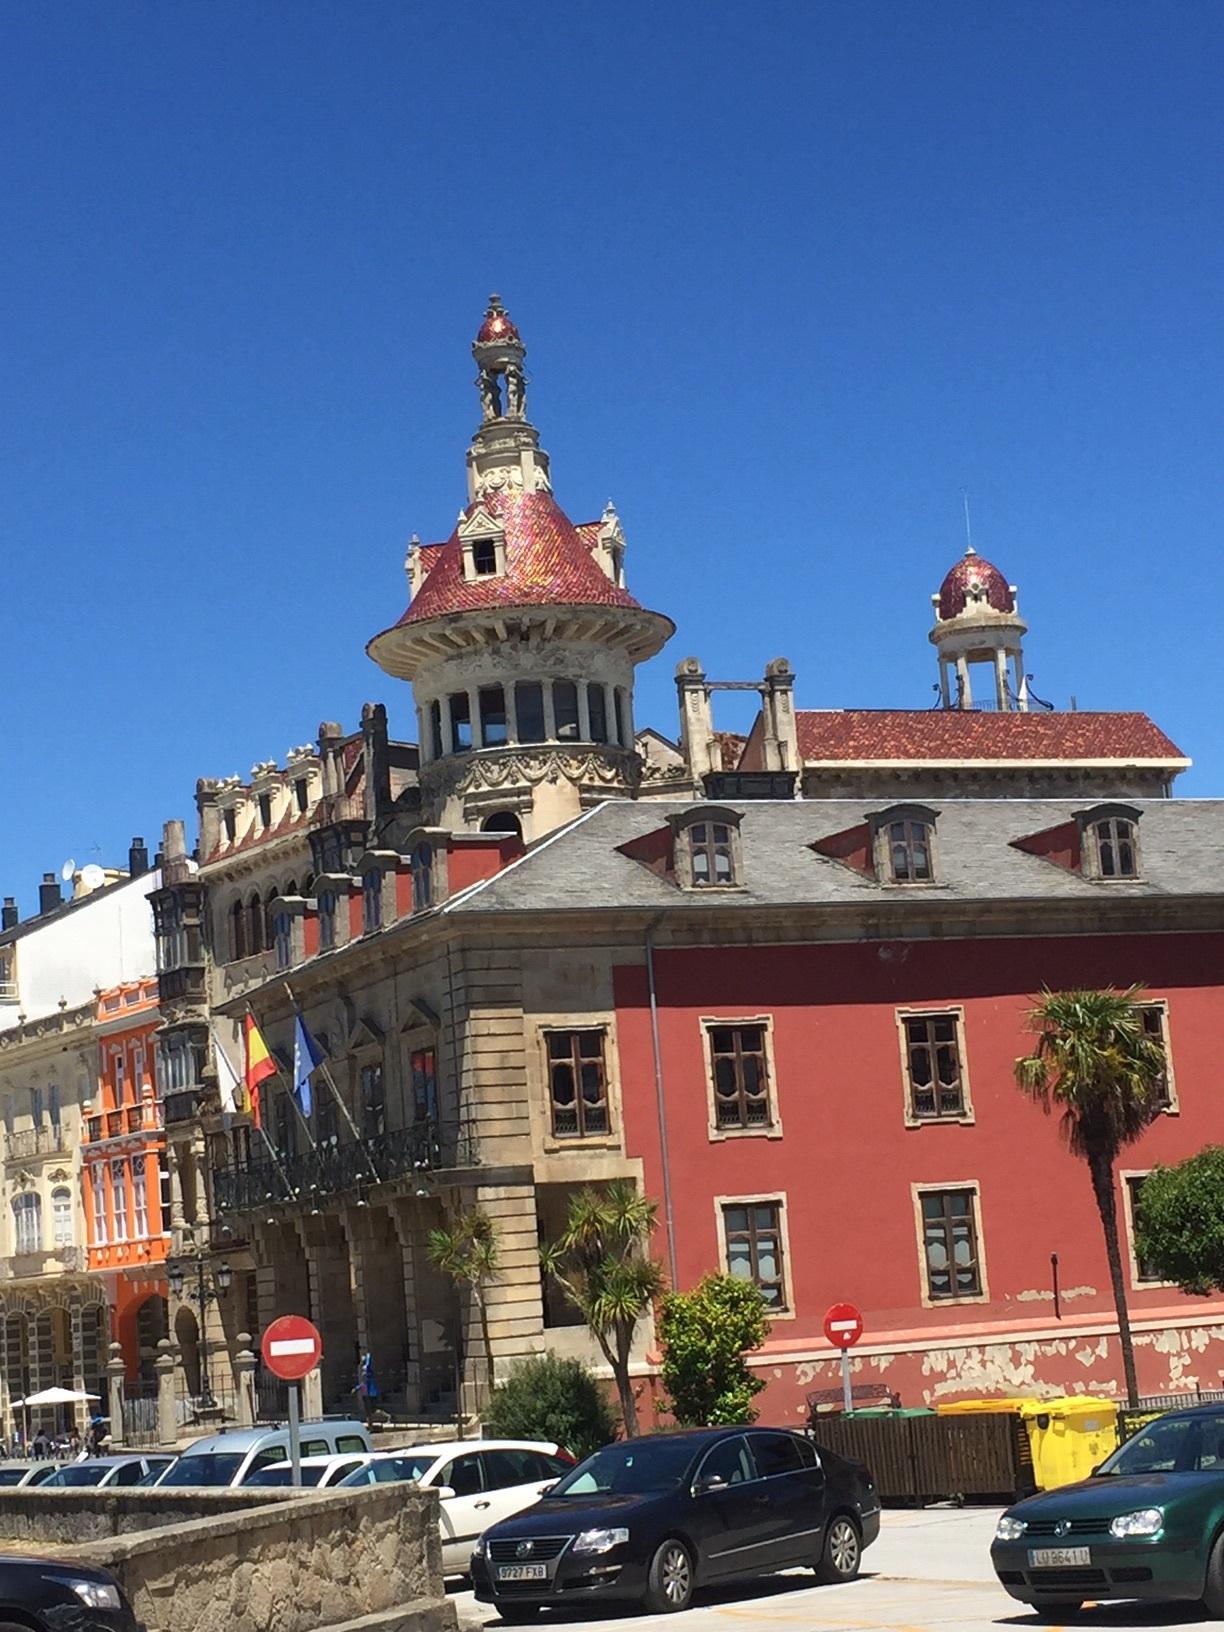 Signature building in Ribadeo